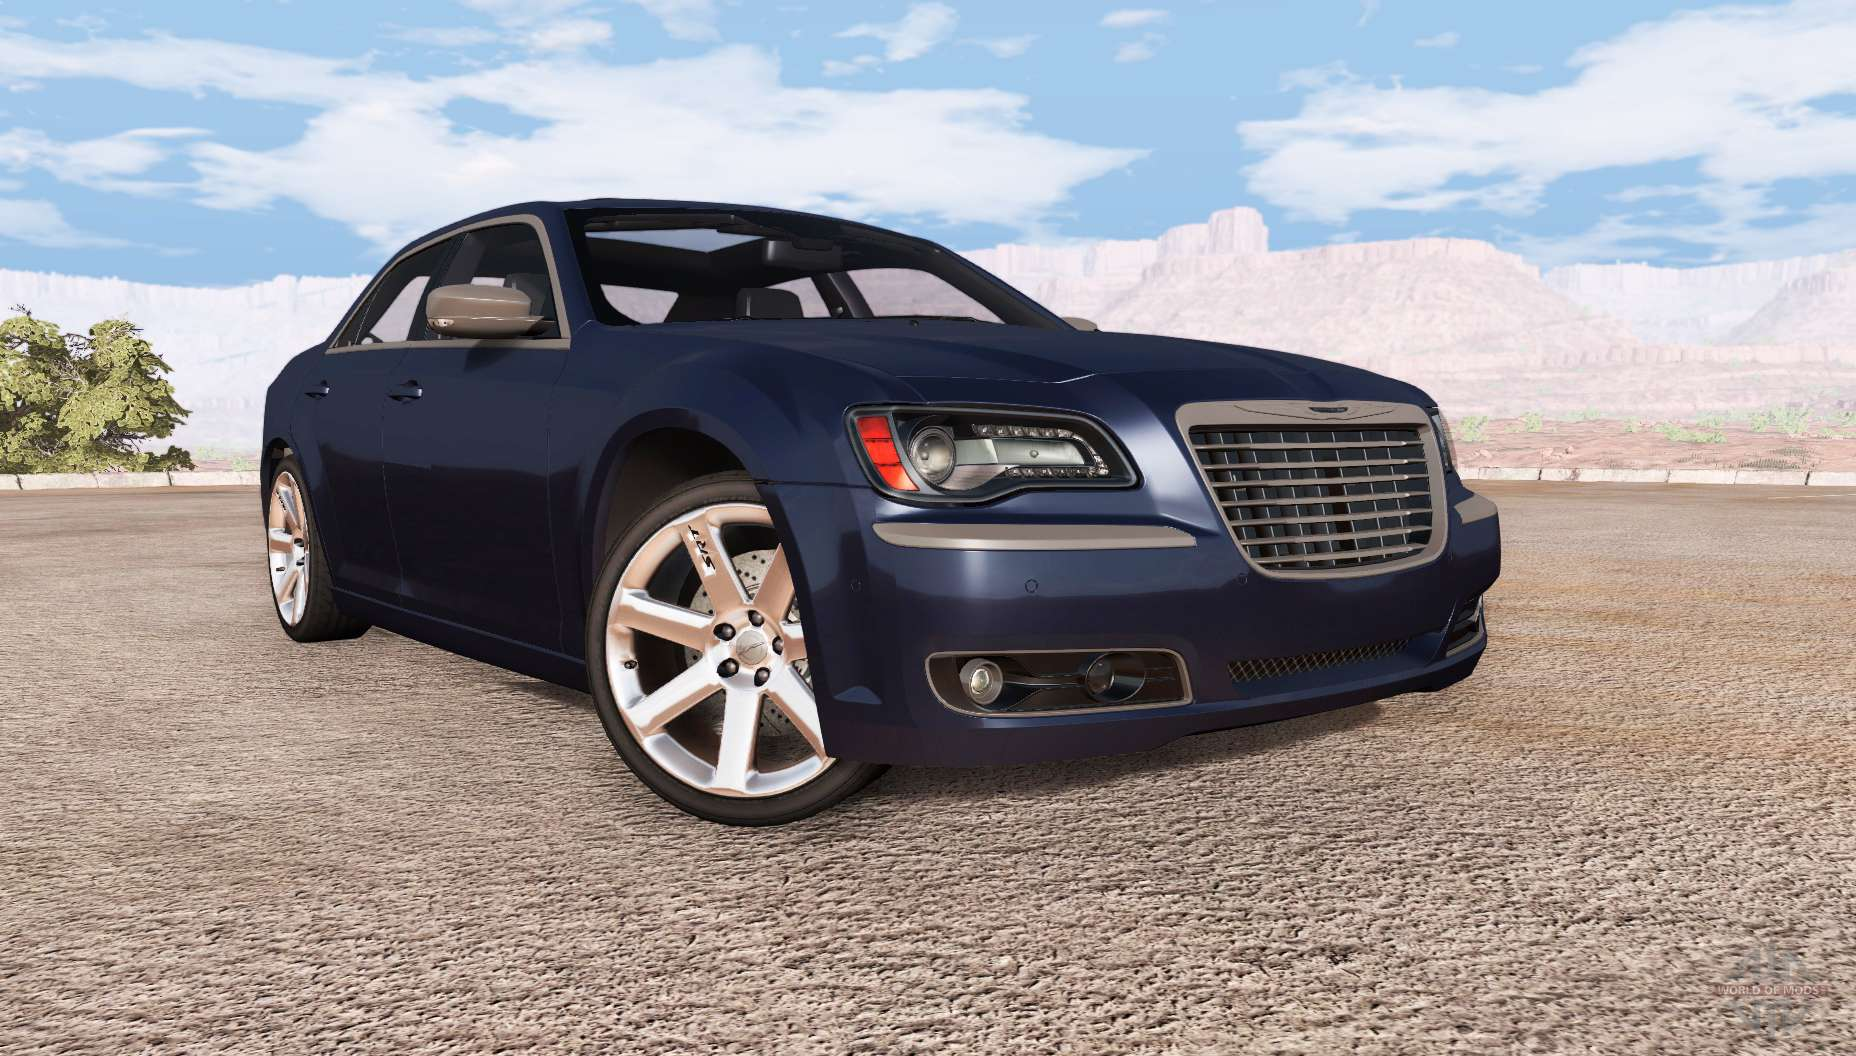 Chrysler 300C (LX2) for BeamNG Drive on gta 5 mitsubishi eclipse, gta 5 batmobile, gta 5 ferrari 250 gto, gta 5 mitsubishi galant, gta 5 volkswagen passat, gta 5 carbonizzare, gta 5 mitsubishi lancer, gta 5 eagle, gta 5 acura tl, gta 5 shelby mustang, gta 5 nissan 370z, gta 5 nissan gt-r, gta 5 holden commodore, gta 5 porsche 918, gta 5 jaguar x-type, gta 5 chevy malibu, gta 5 nissan 240sx, gta 5 ford bronco, gta 5 hennessey venom gt, gta 5 acura nsx,